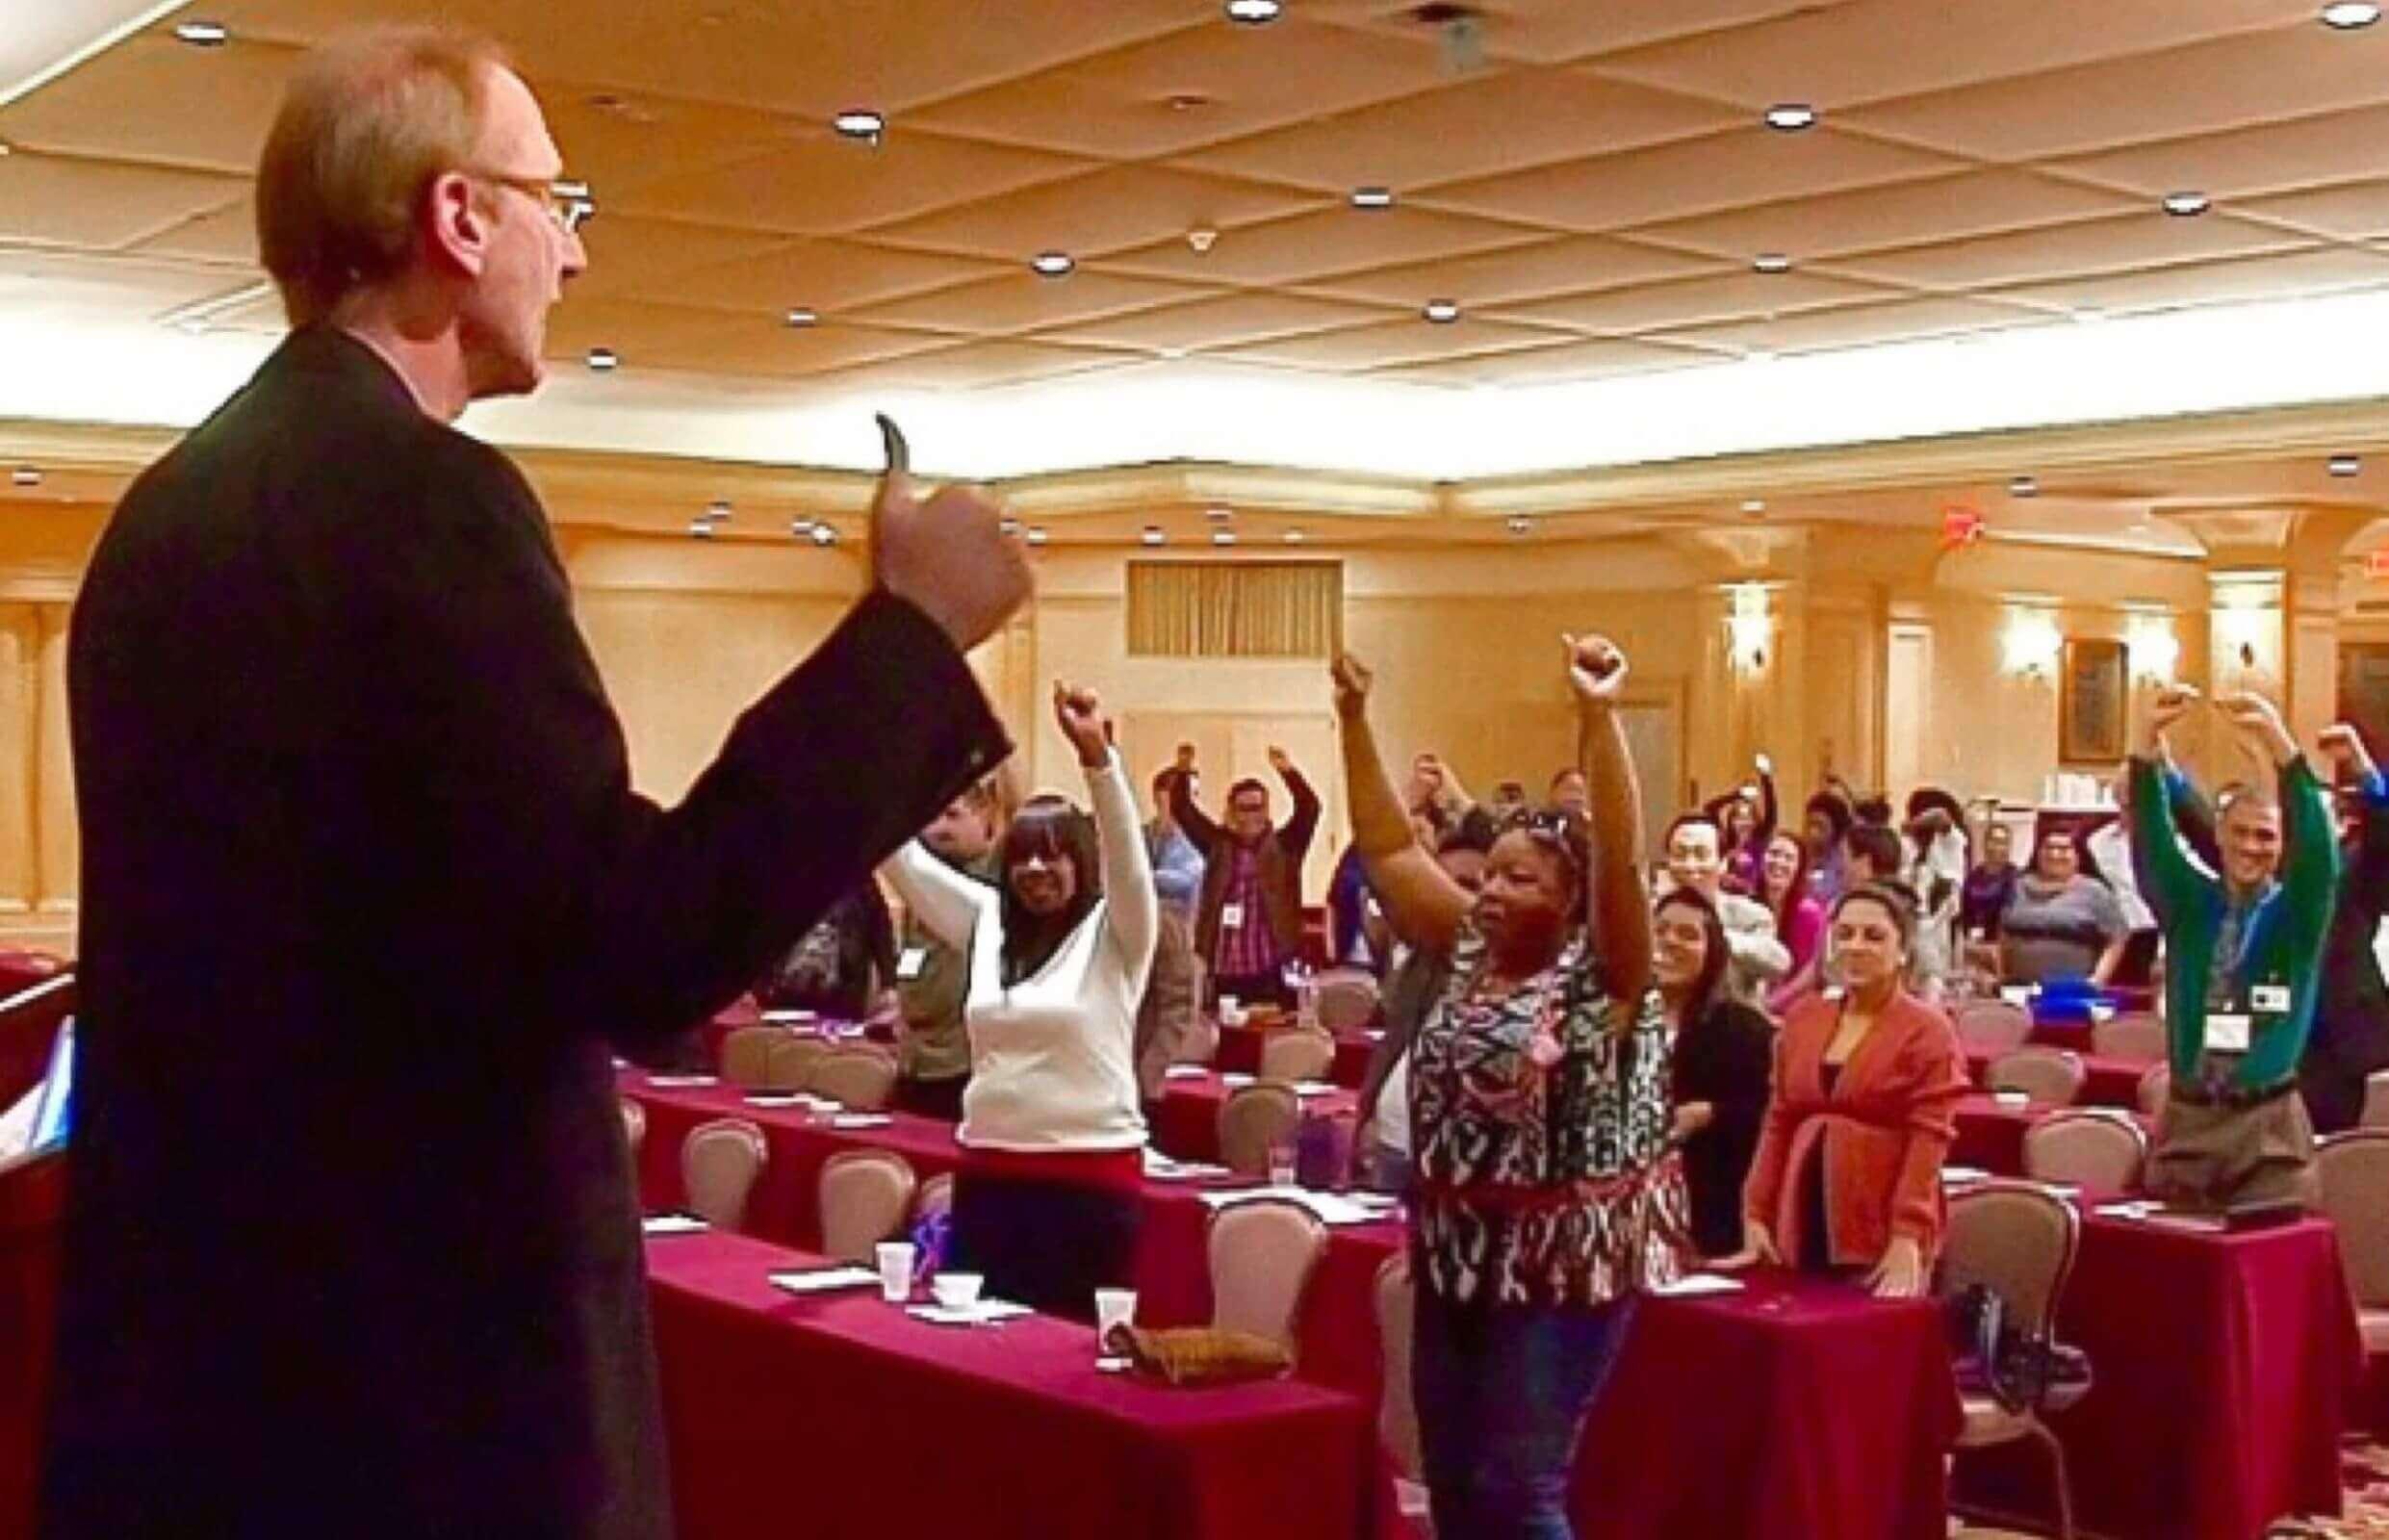 Joe Robinson gives work life balance training